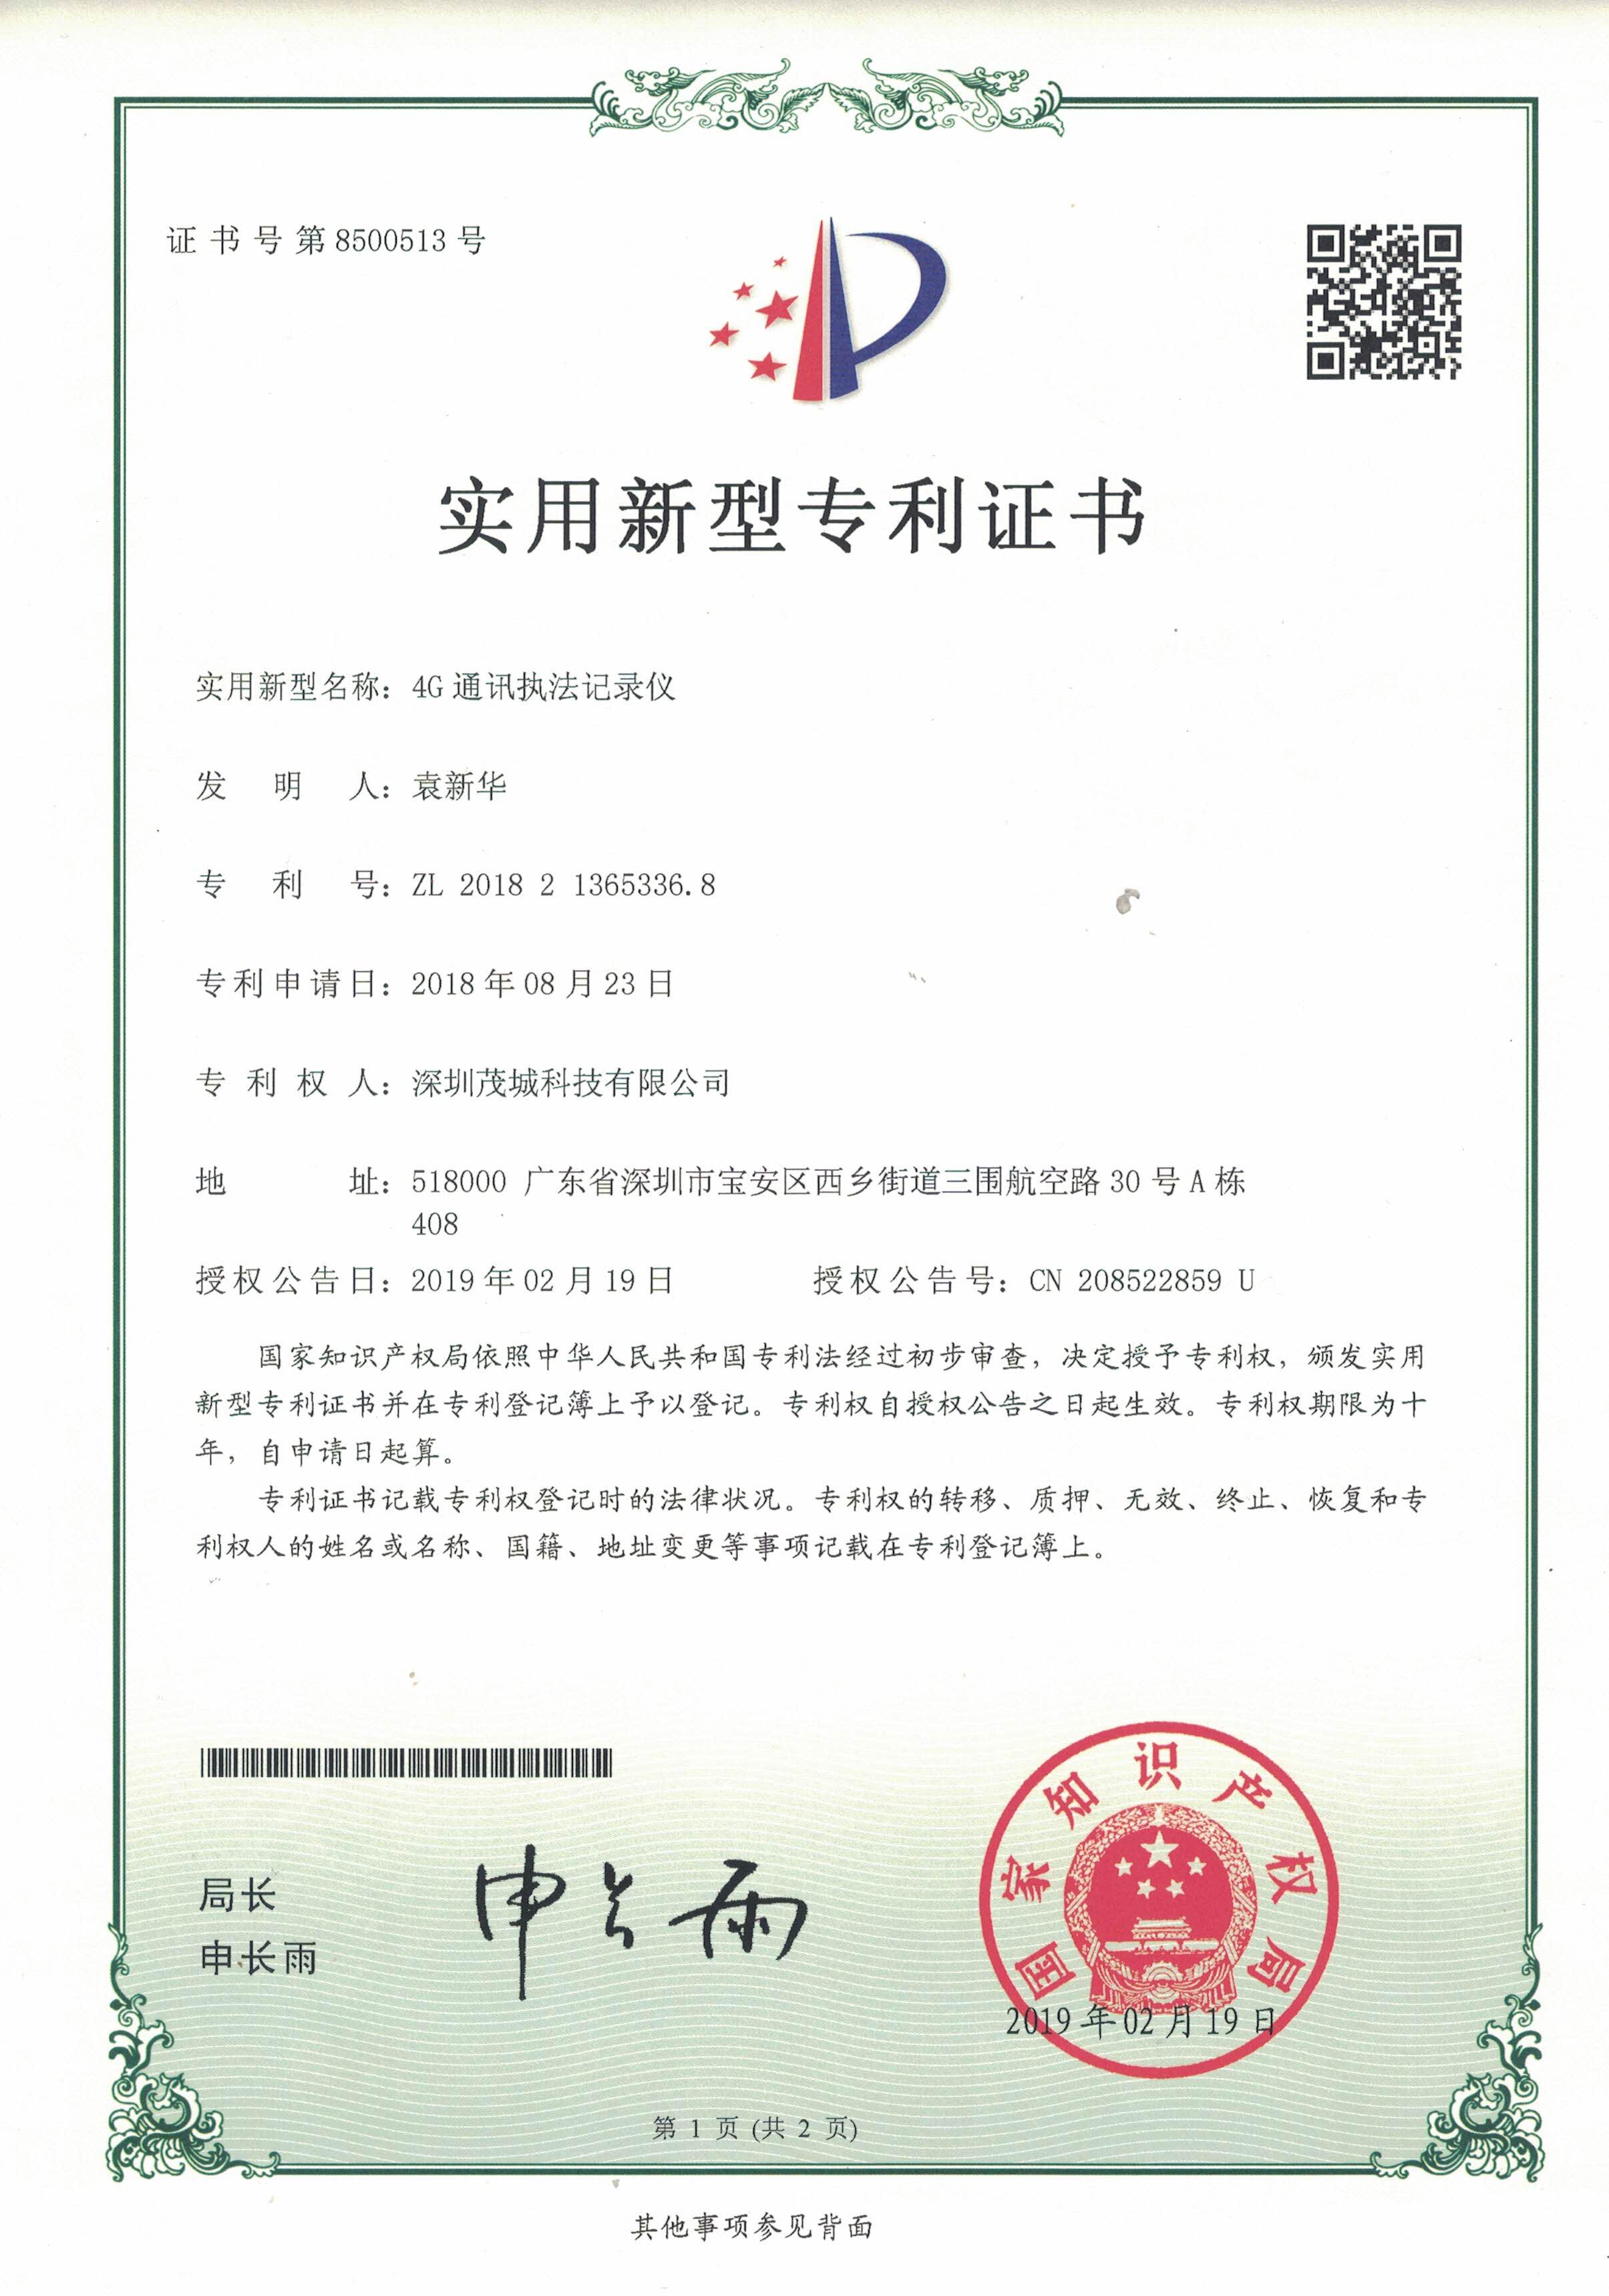 4G Body Camera Certificate of Patent